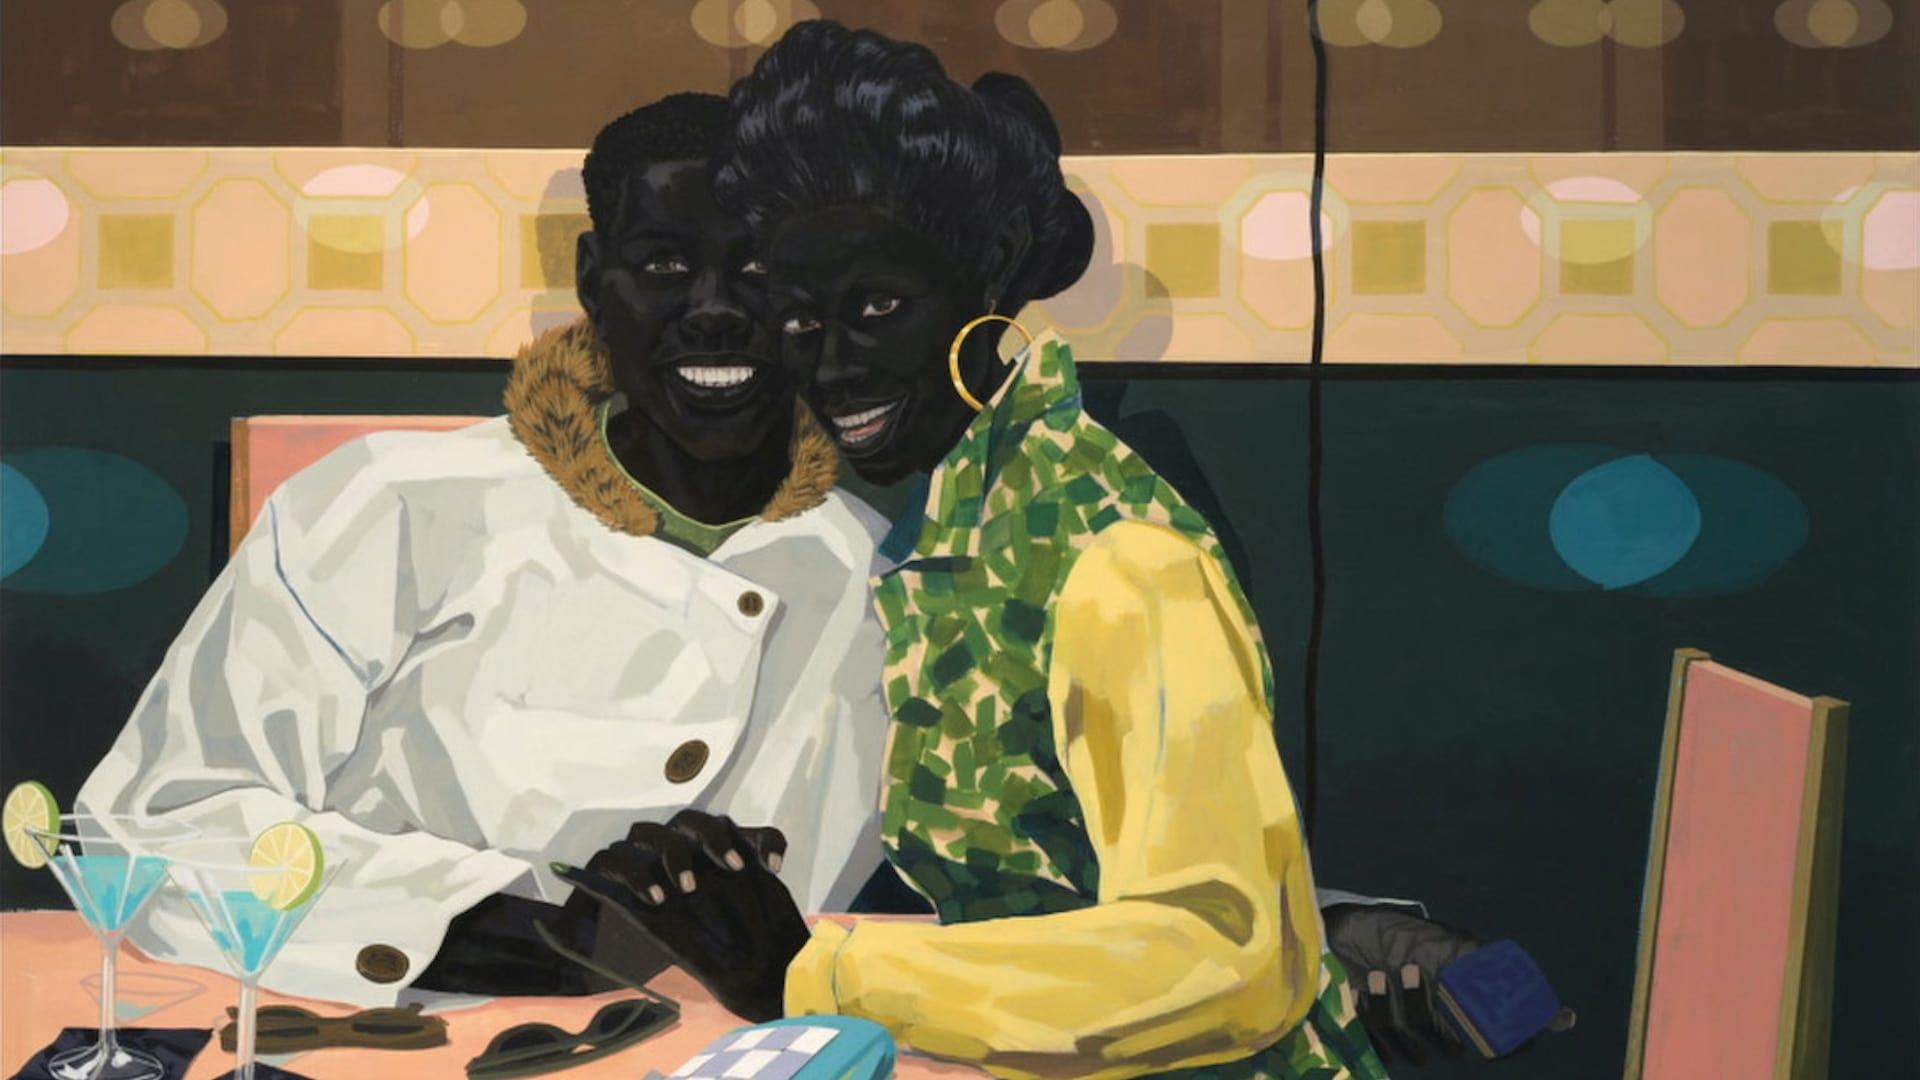 Black Art: In the Absence of Light